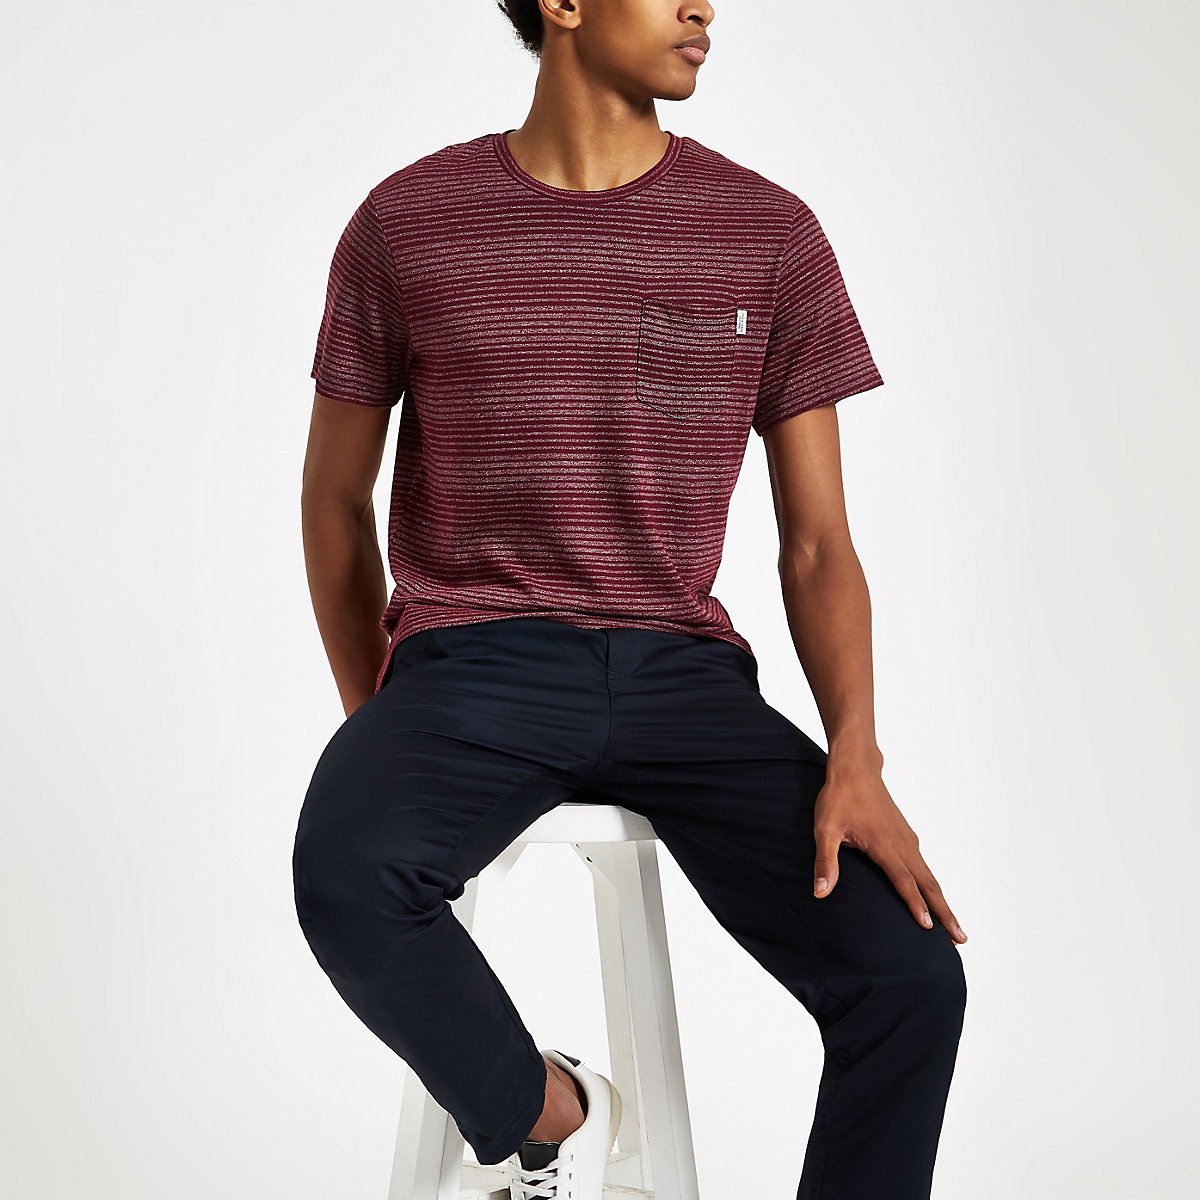 Jack & Jones burgundy stripe T-shirt